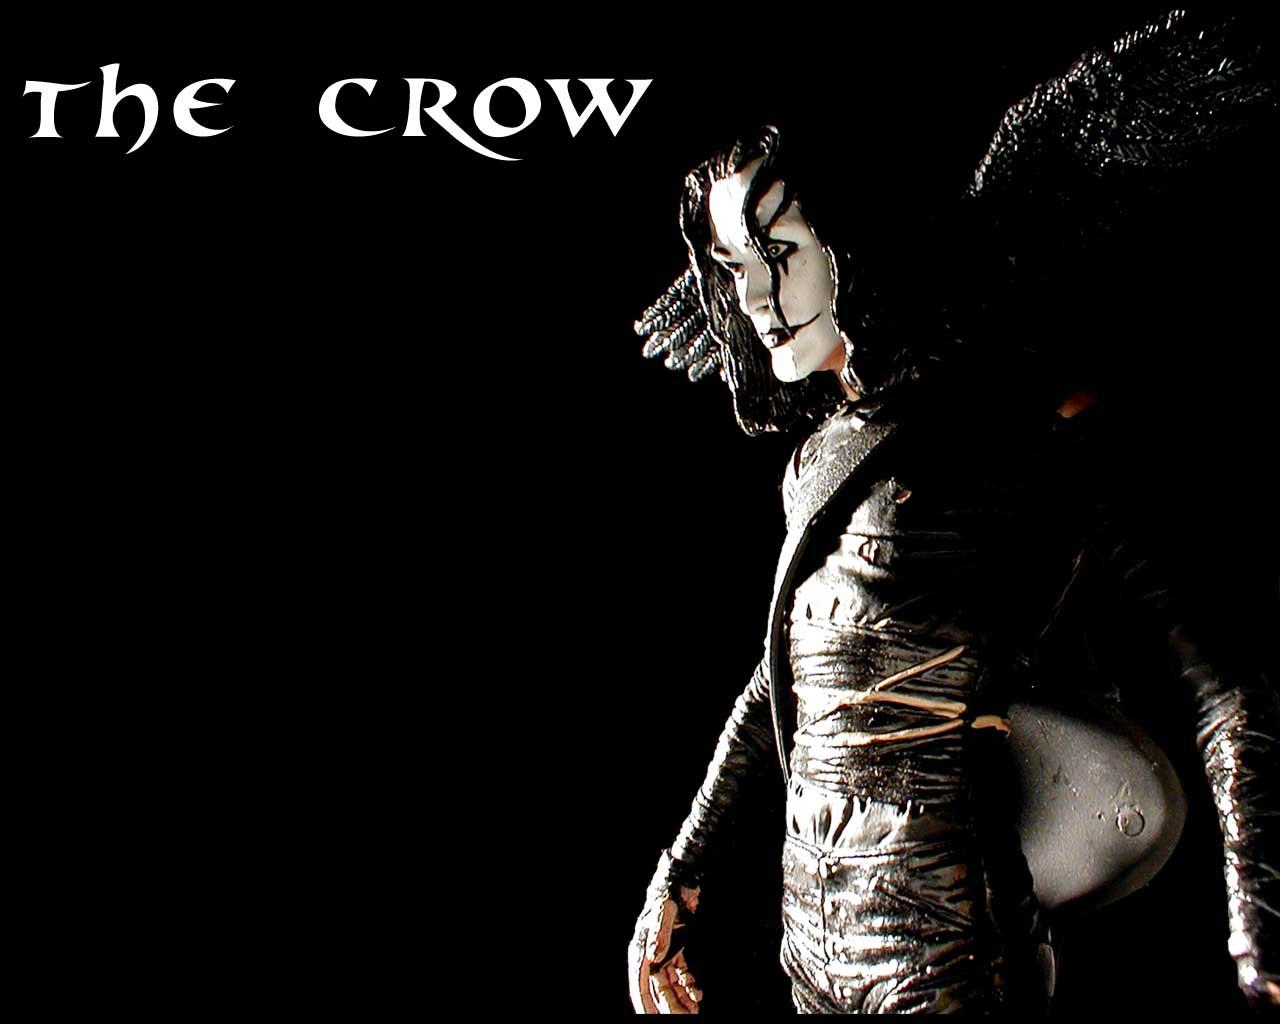 The Crow Quotes Wallpaper | www.pixshark.com - Images ...